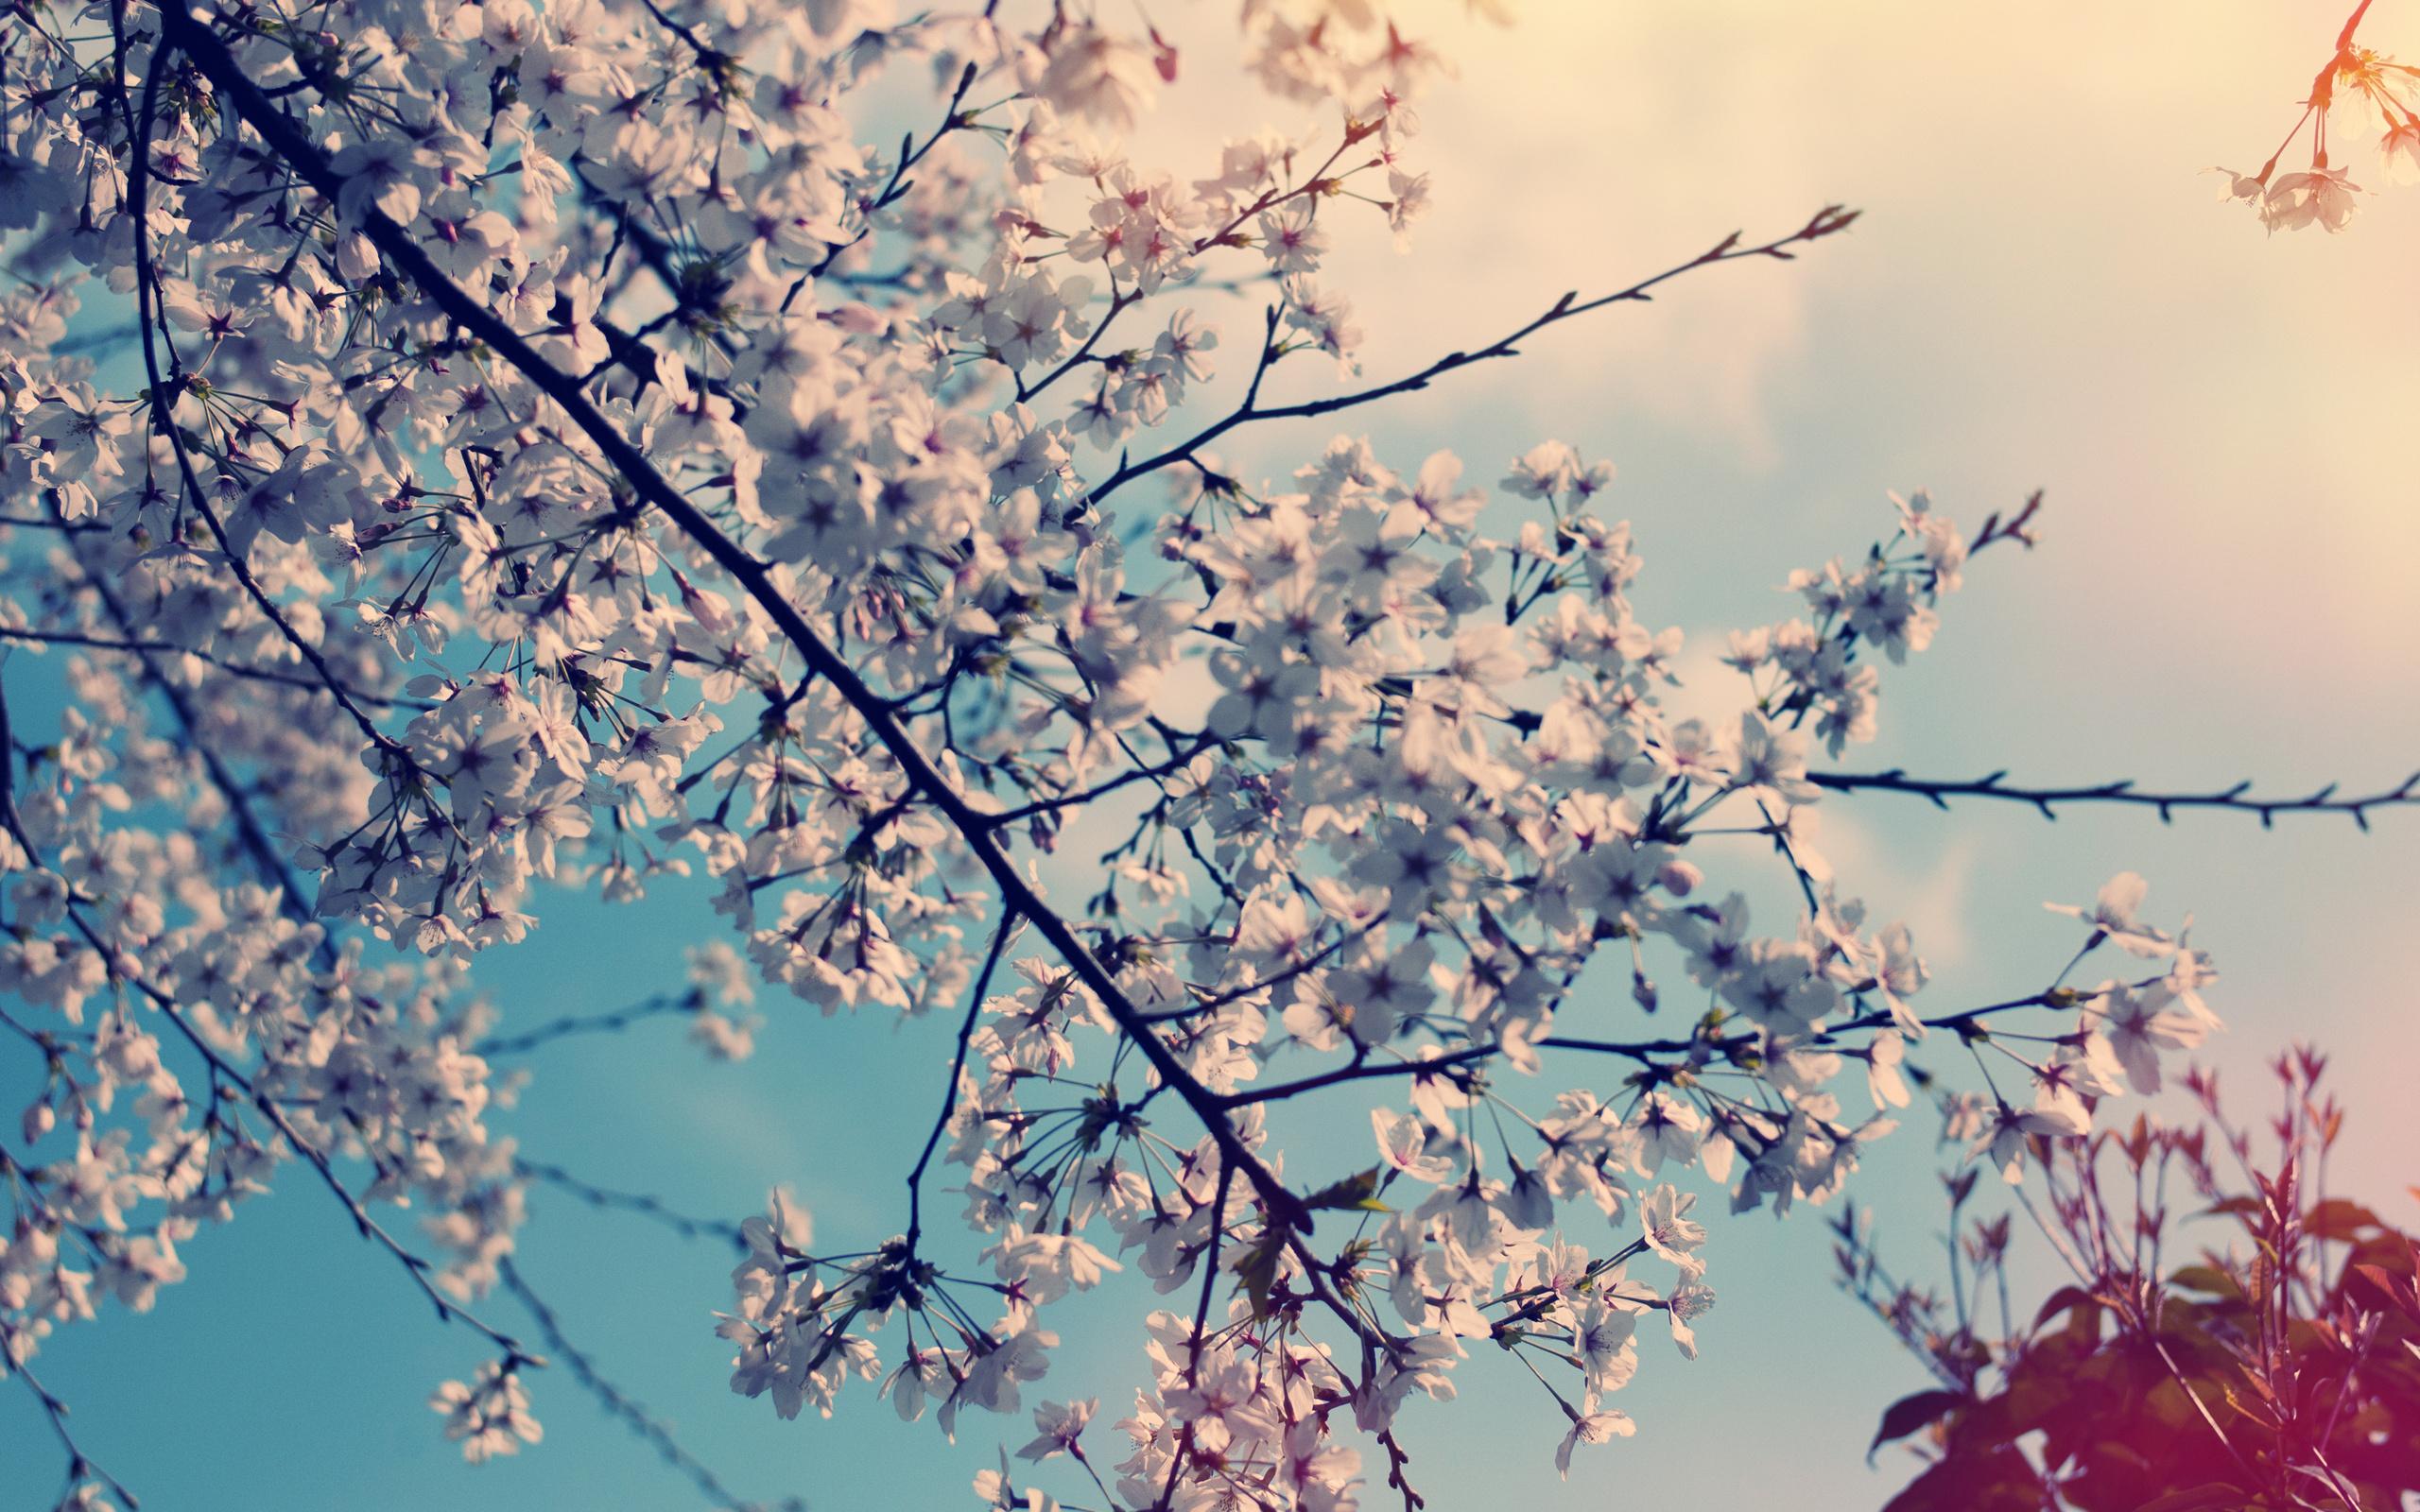 Earth Blossom 2560x1600